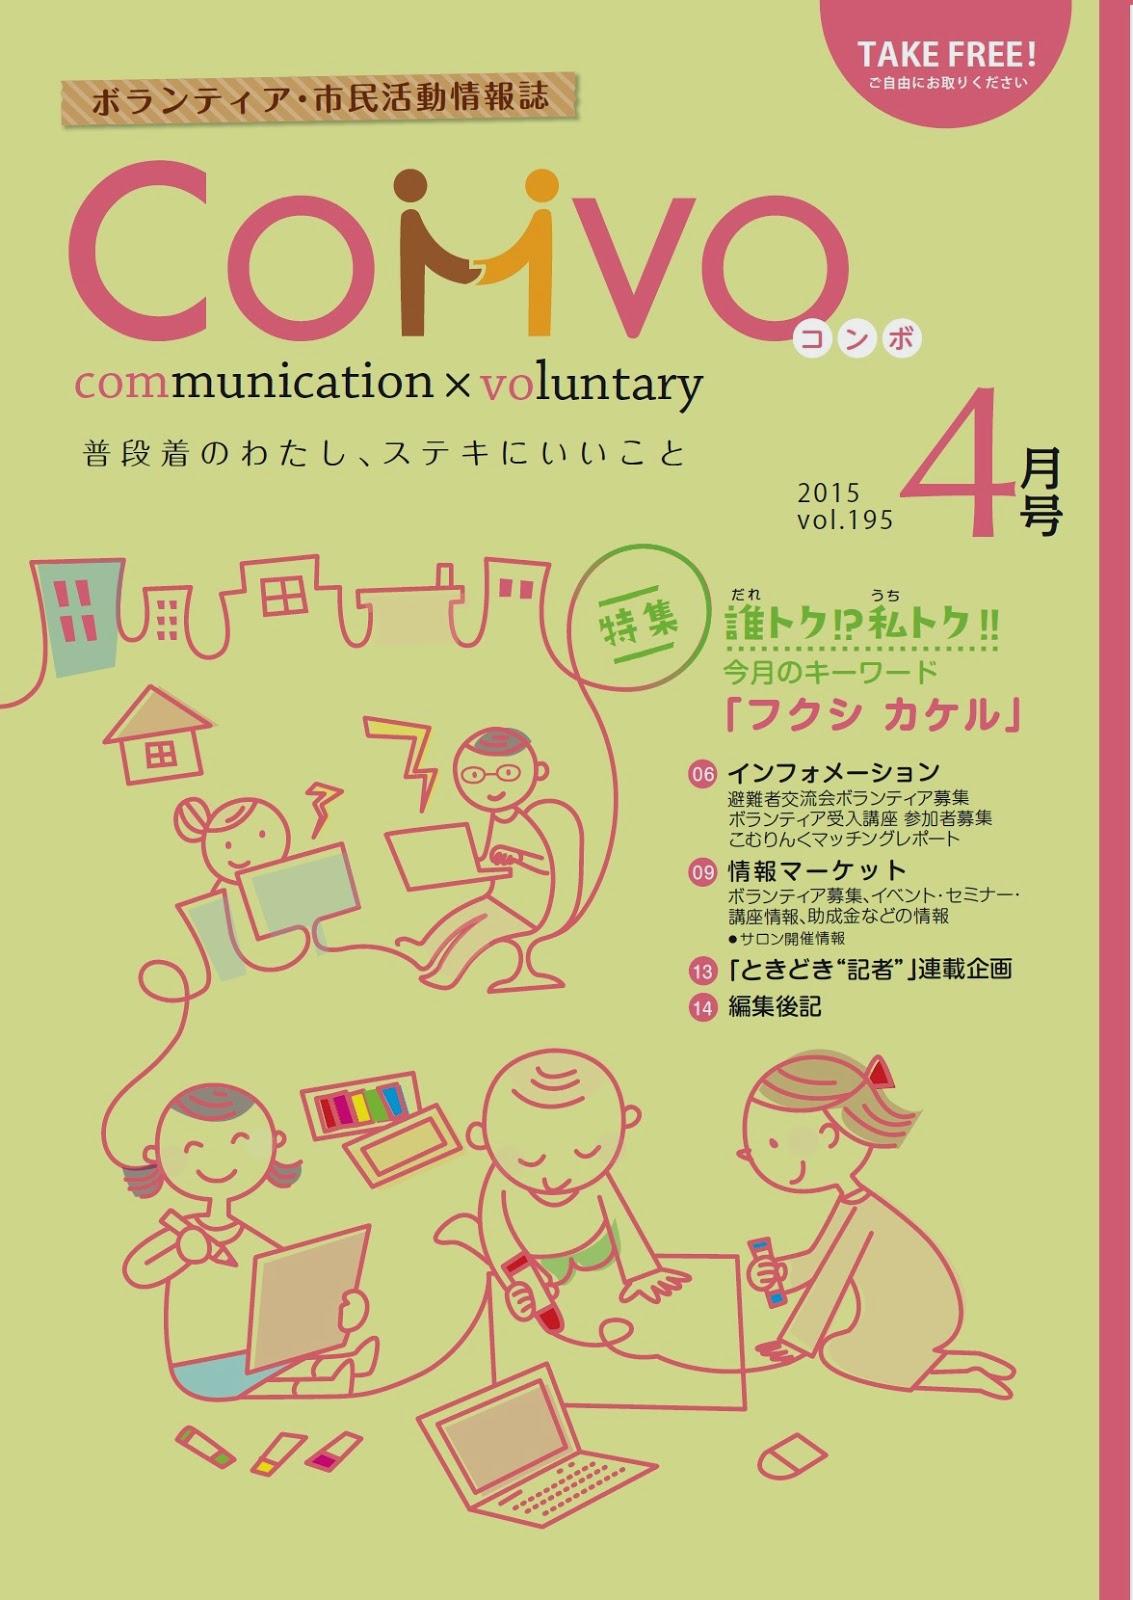 http://comvo.lekumo.biz/home/